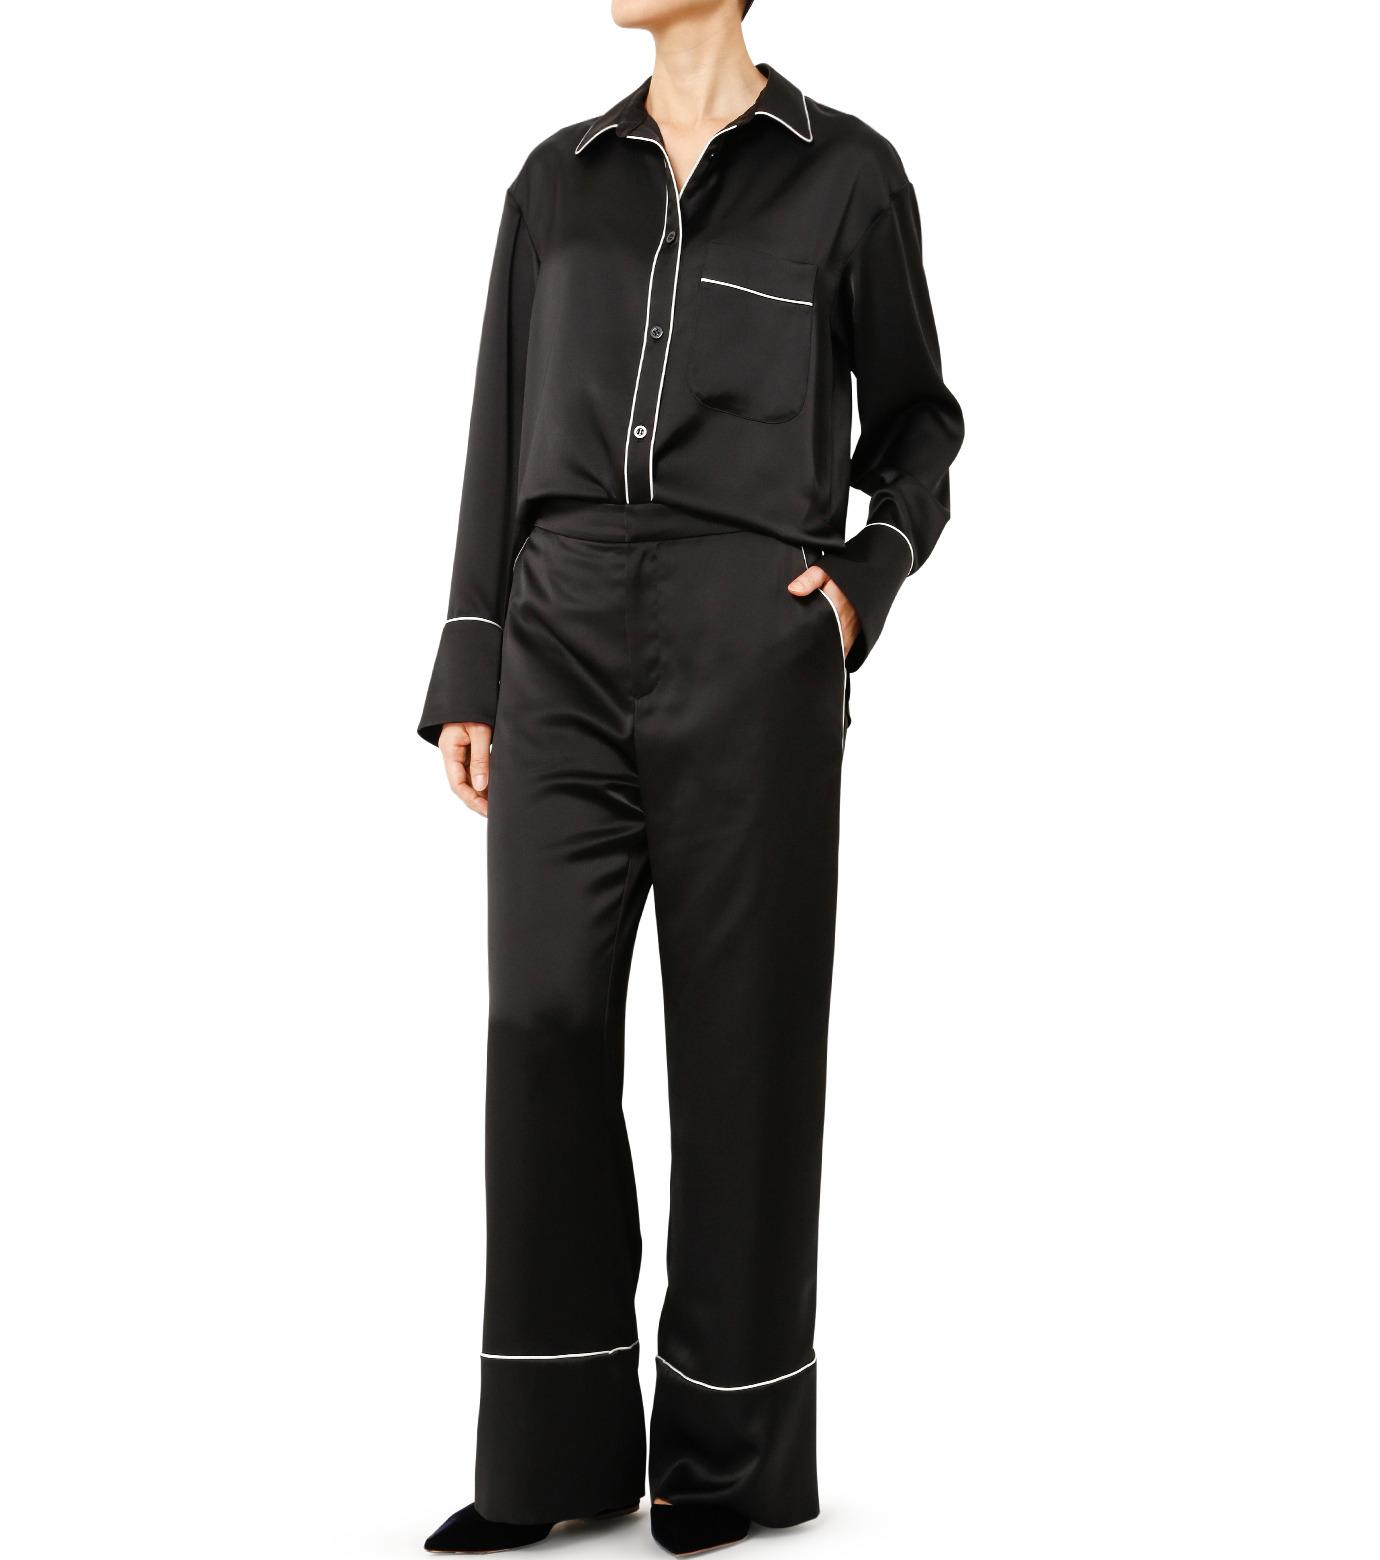 LE CIEL BLEU(ルシェルブルー)のパジャマルックパンツ-BLACK(パンツ/pants)-19S68101 拡大詳細画像2